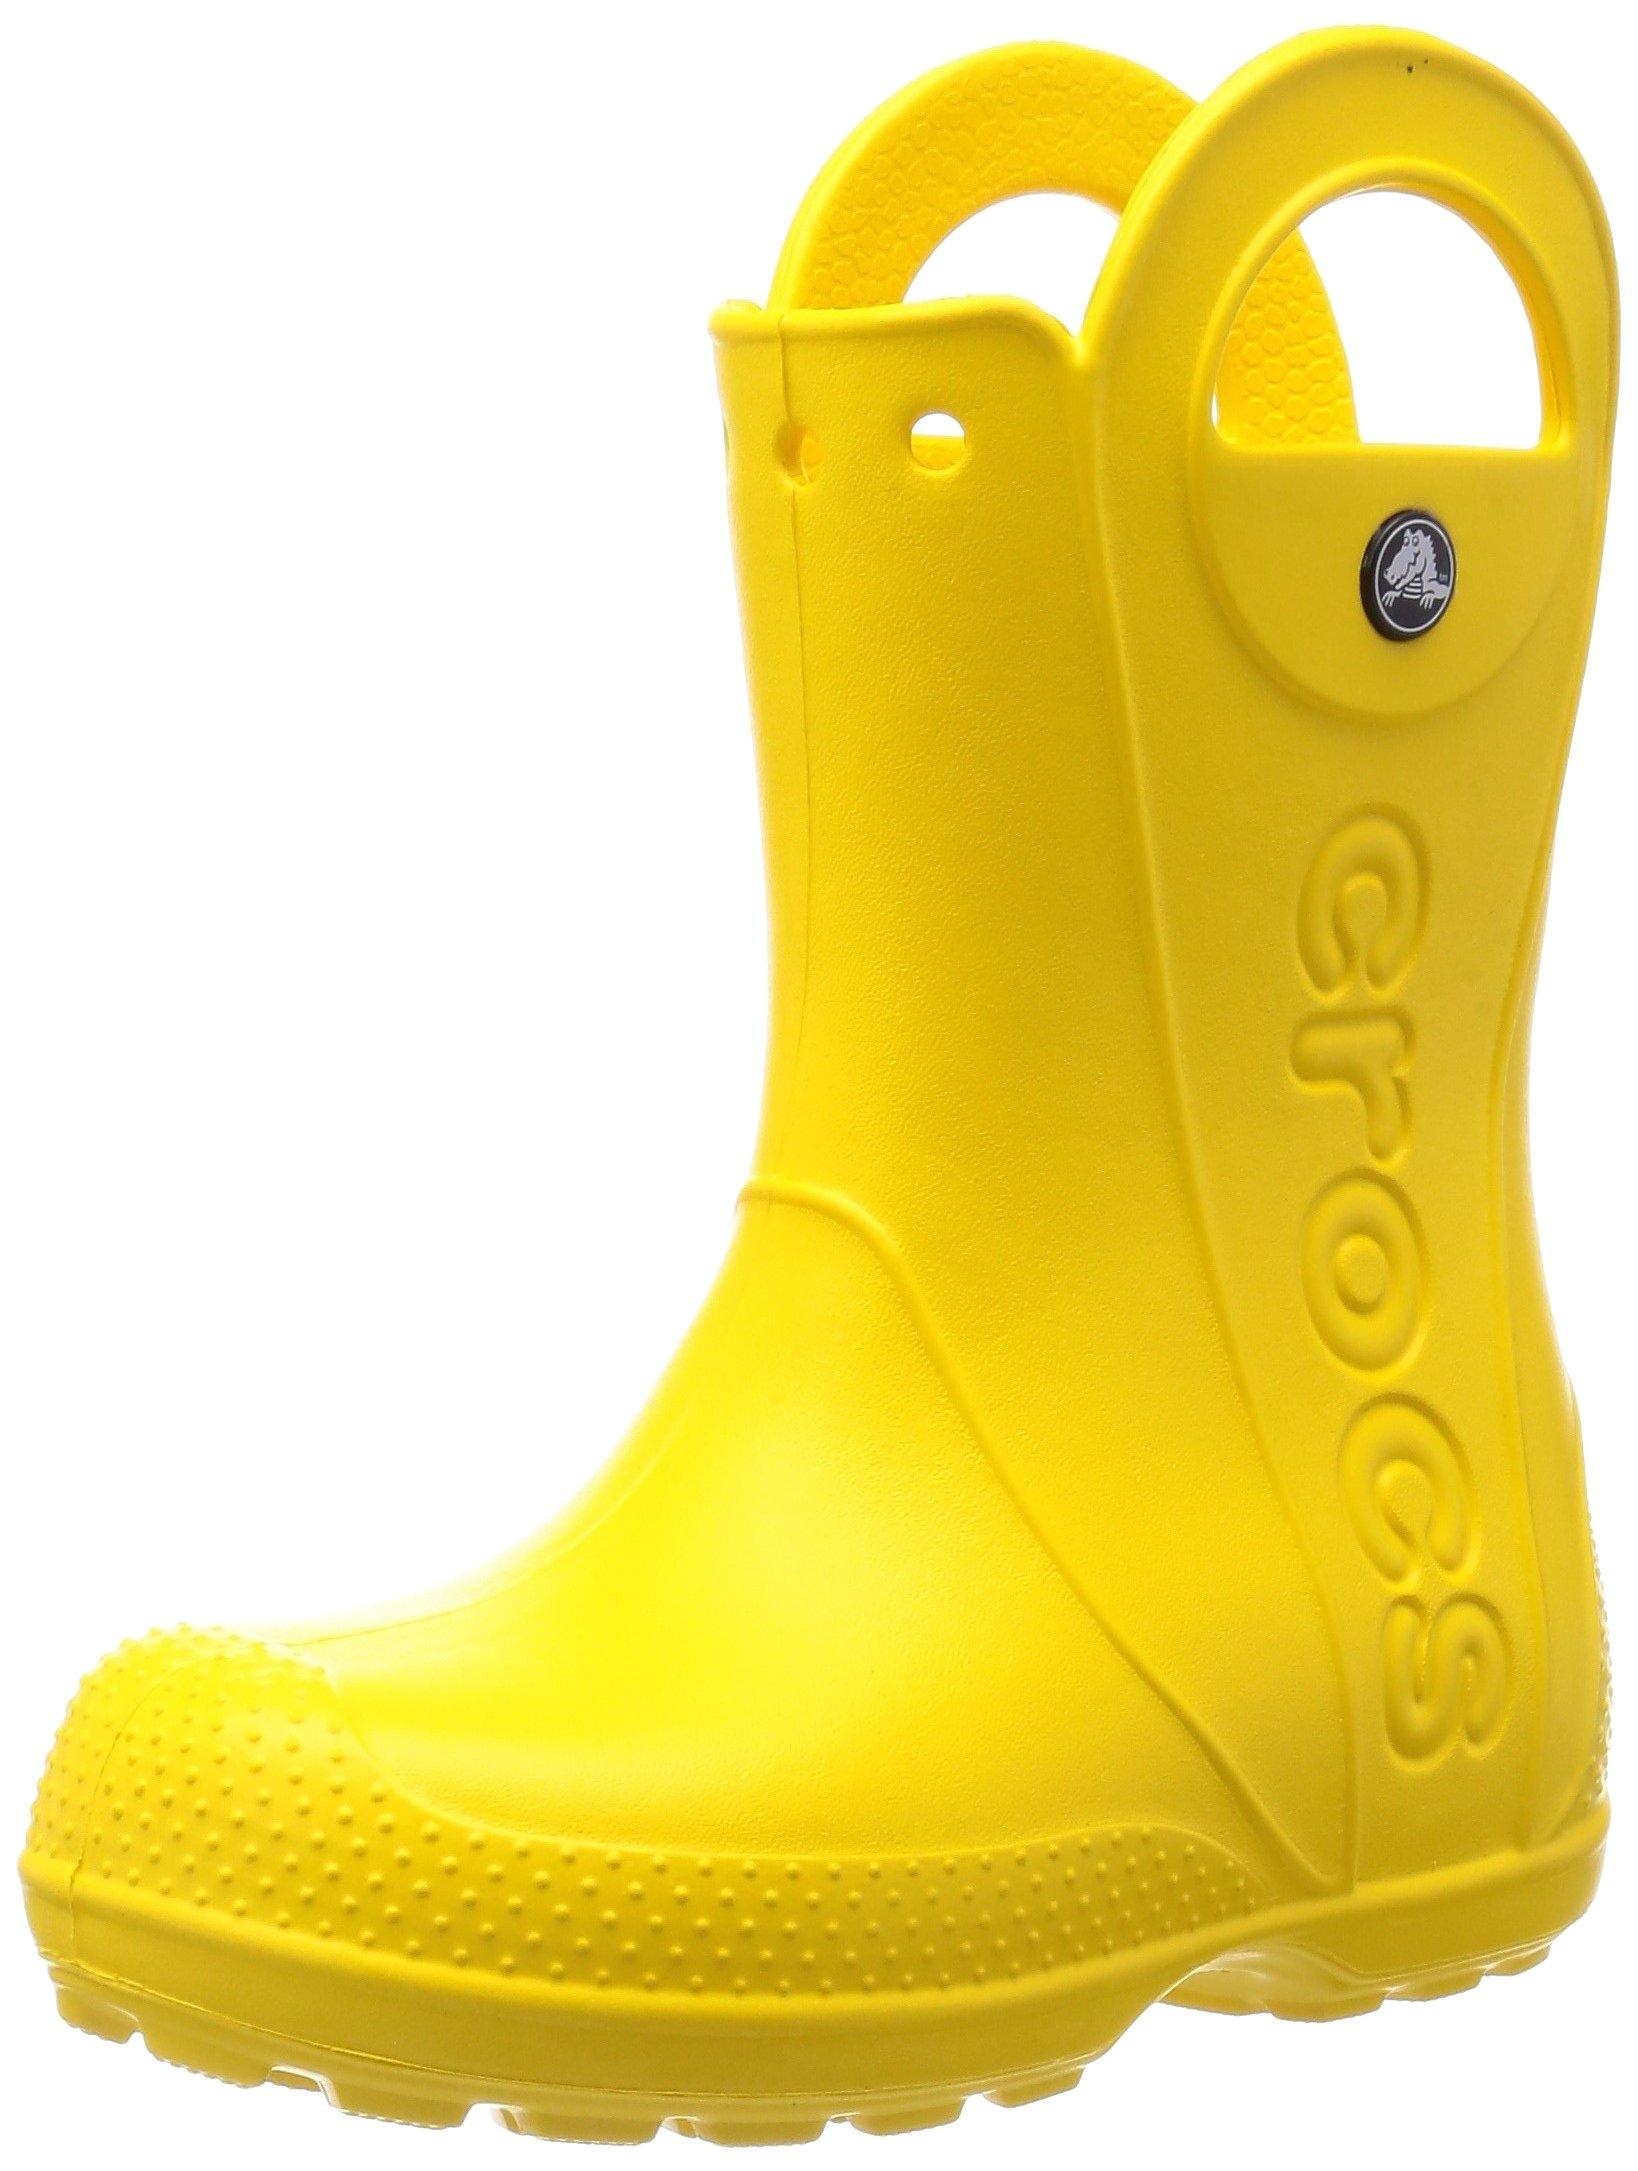 Crocs Kids' Handle It Boot,Yellow,10 M US Toddler